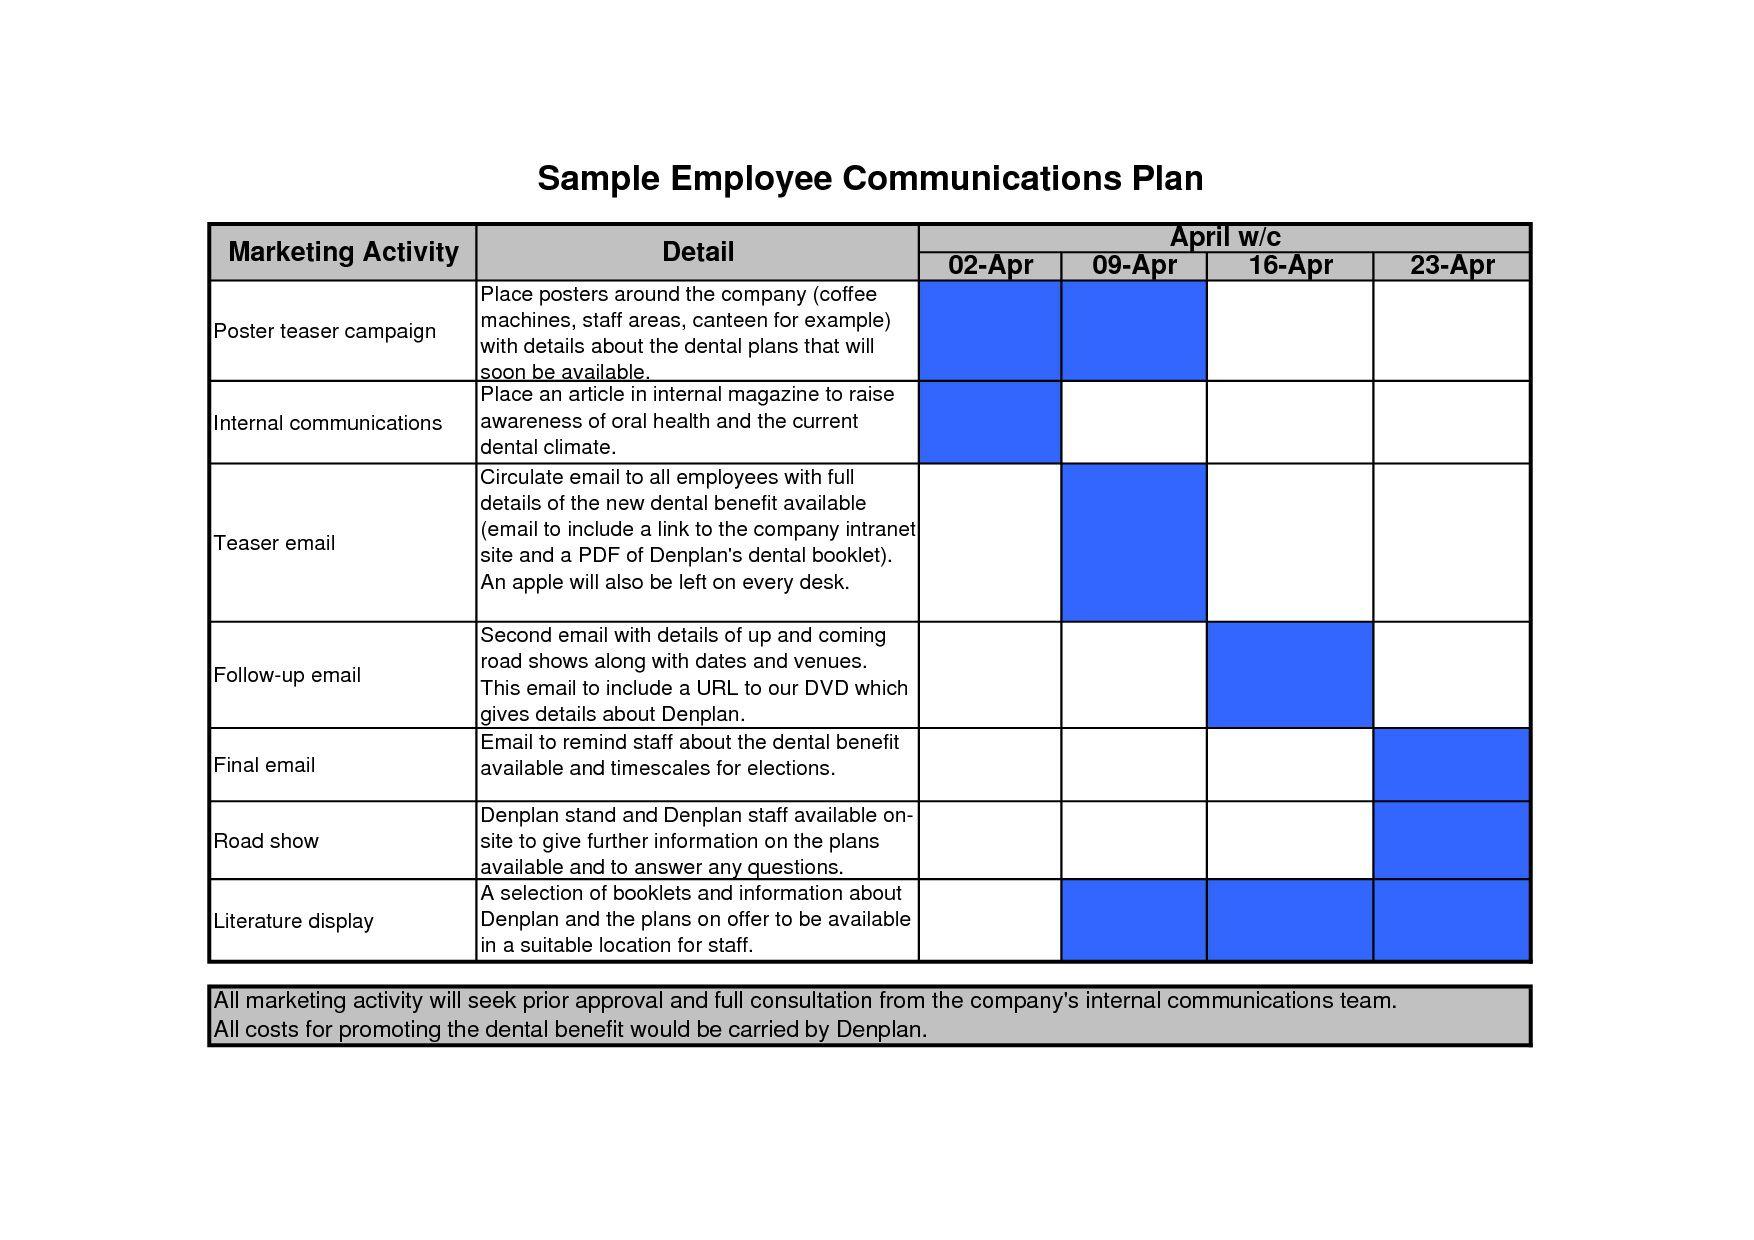 002 Breathtaking Marketing Communication Plan Template Image  Example Pdf Excel IntegratedFull